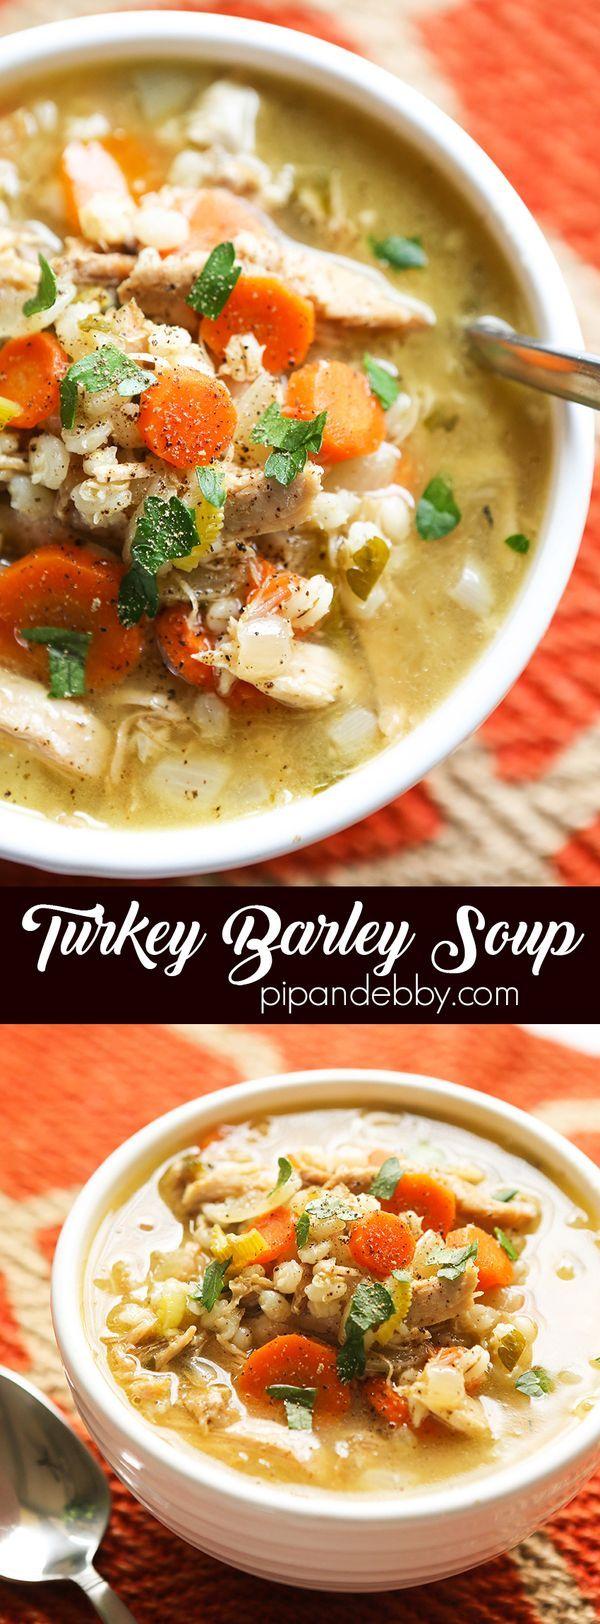 Crockpot Turkey Barley Soup Recipe - pipandebby.com